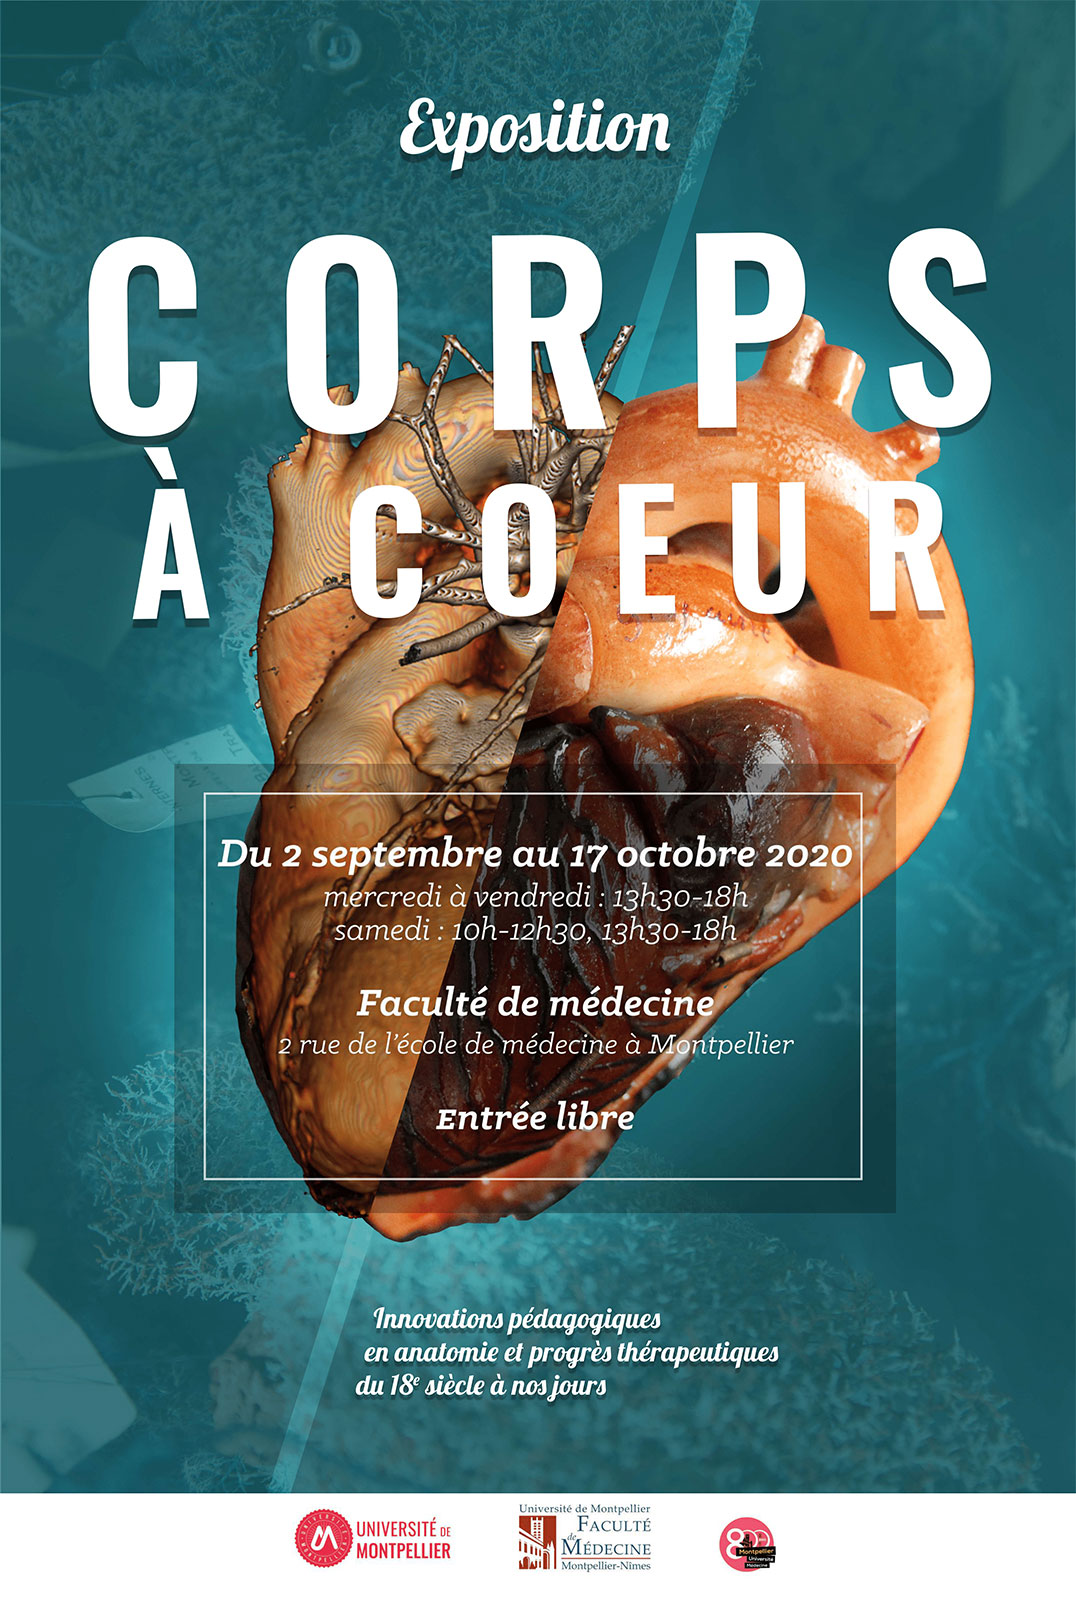 corps-acoeur-expo